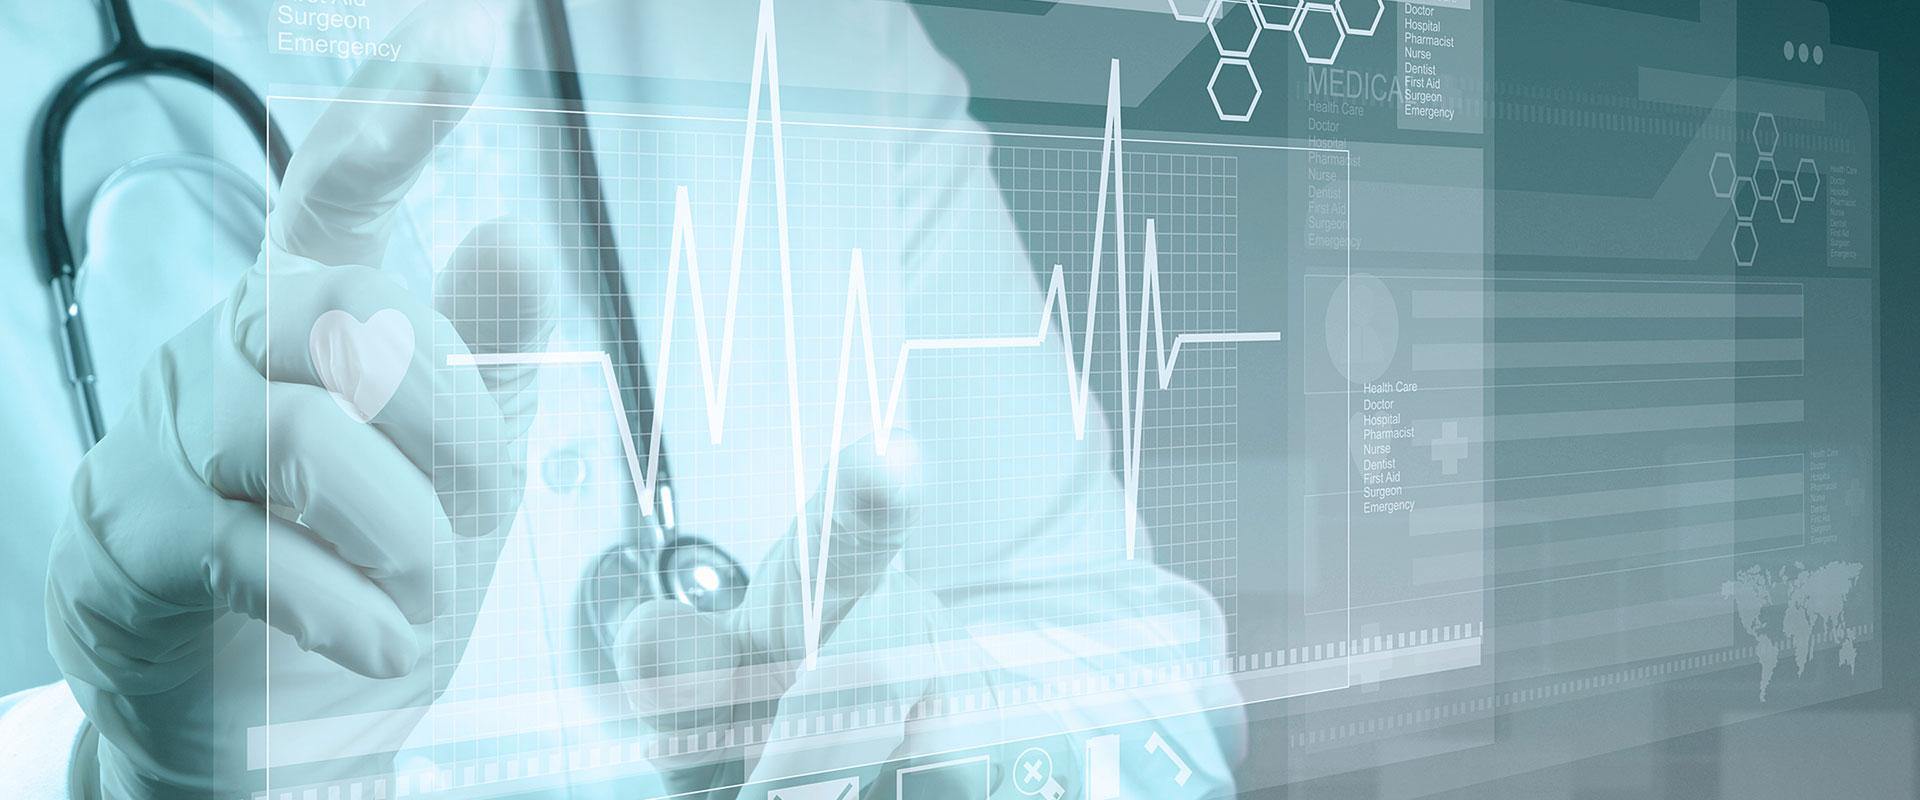 laboratorio-exame-medico-diagnostico-niteroi-dme-home-slide041